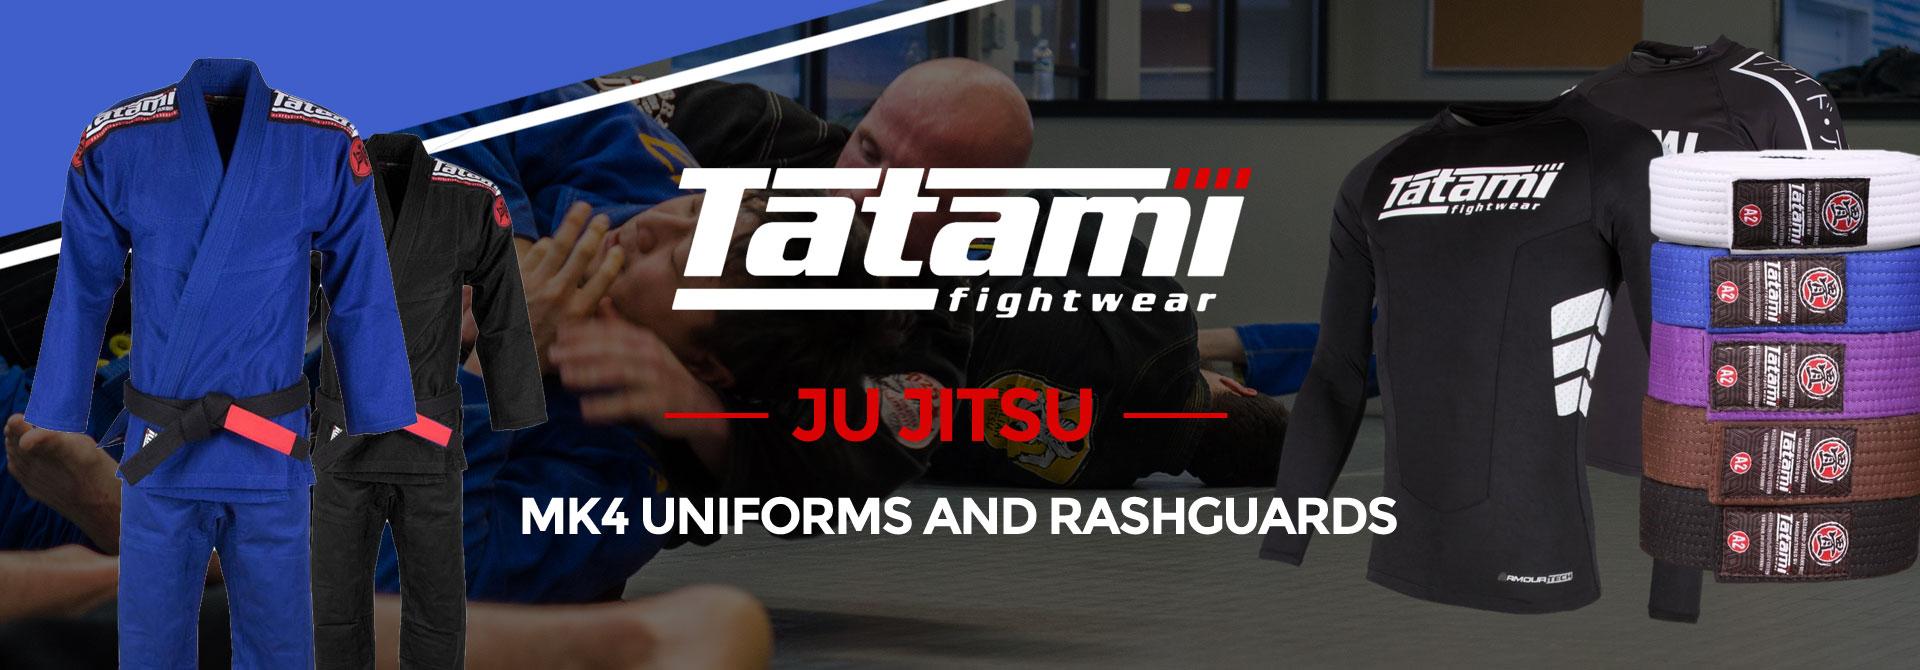 Martial Arts Suppliers of Taekwondo Uniforms Judo uniforms